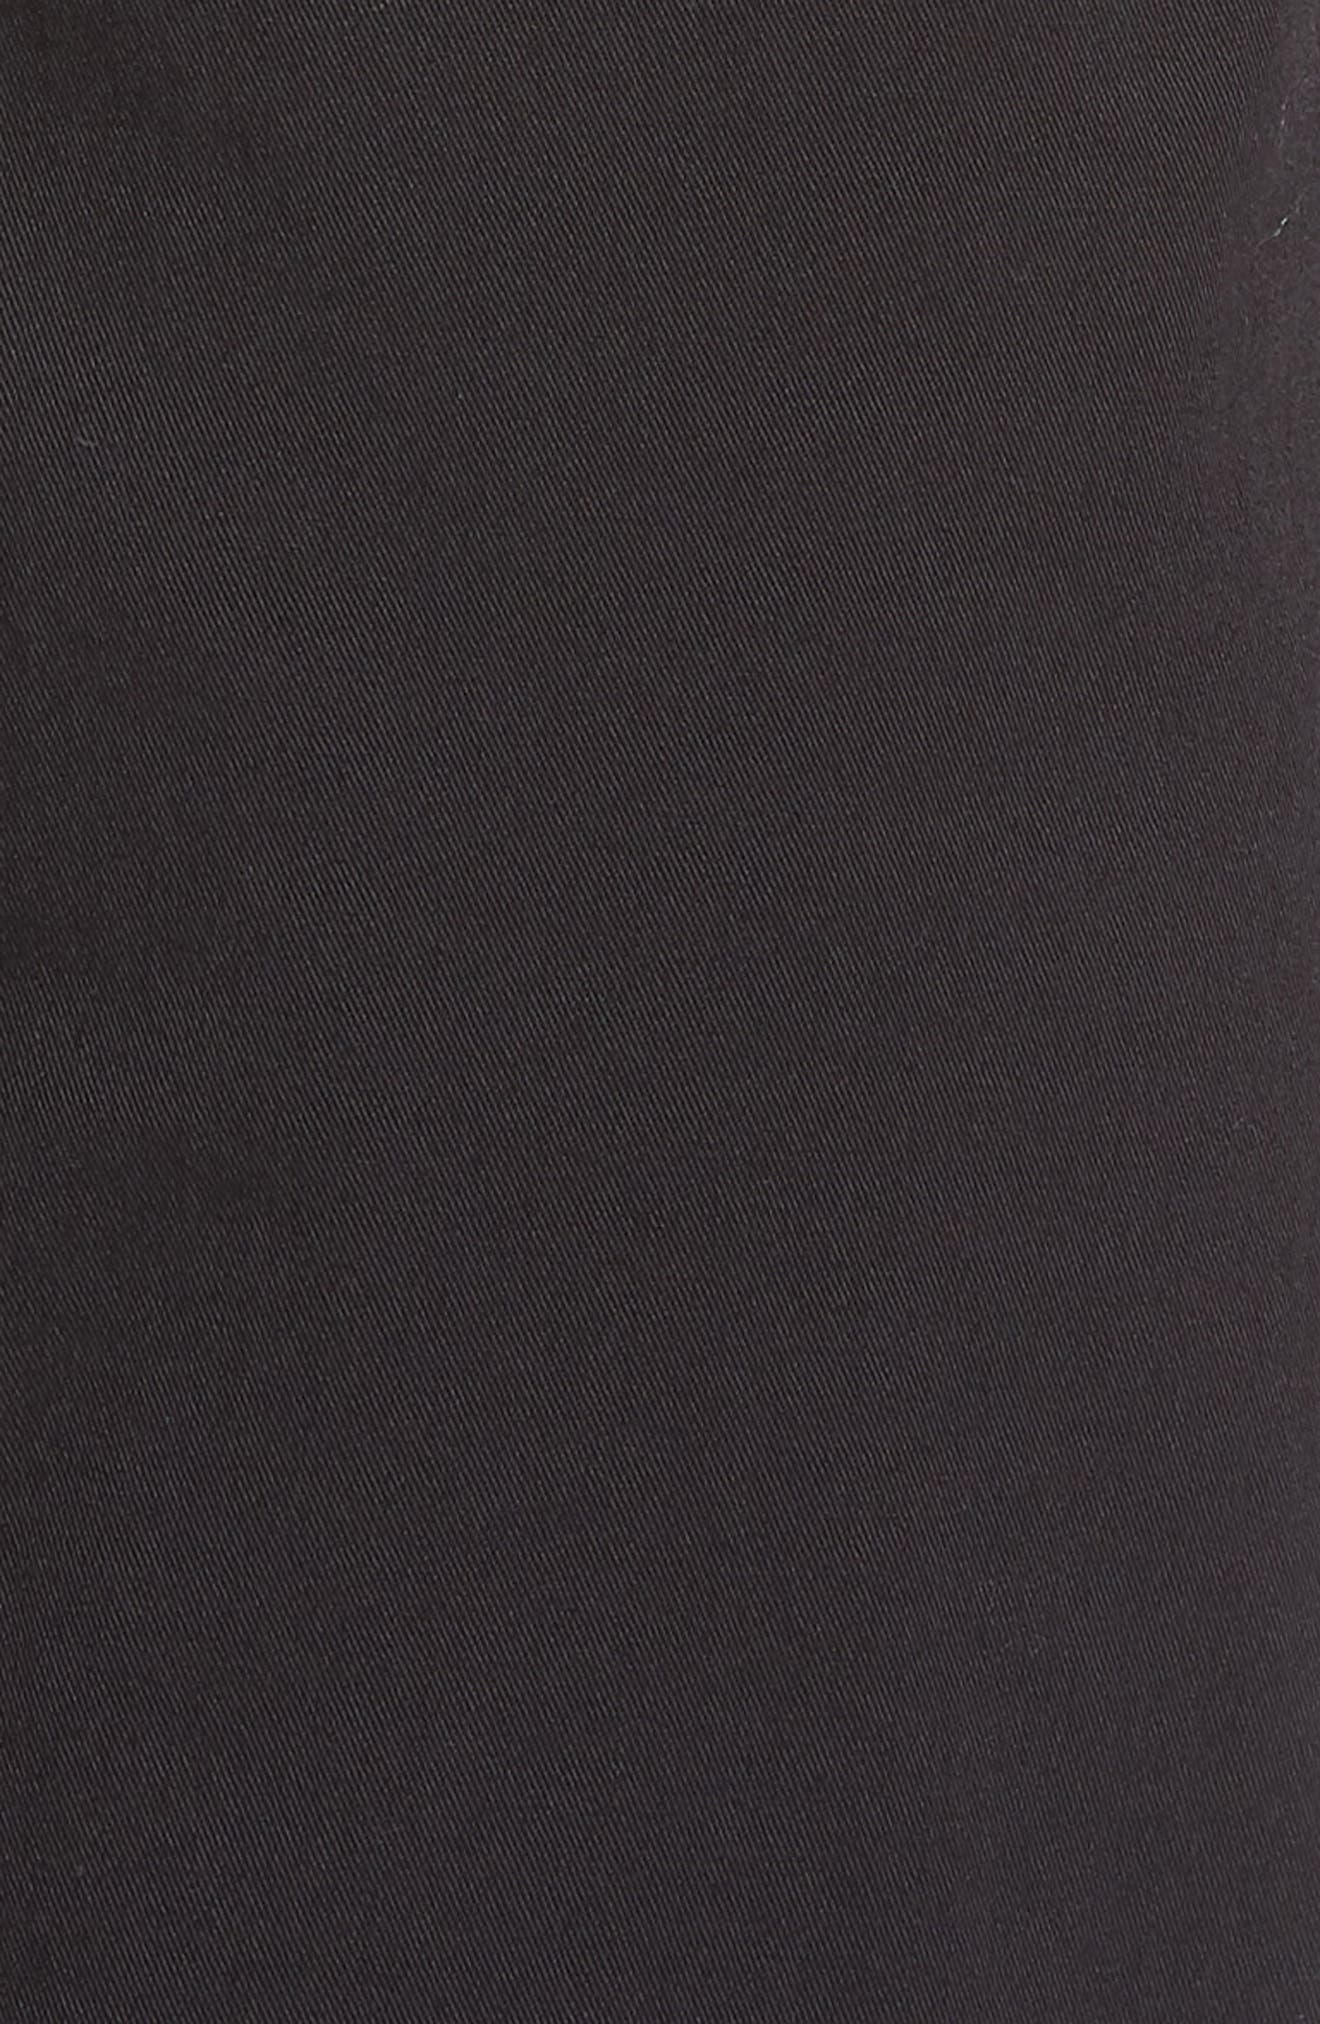 Cordura Slim Fit Cargo Pants,                             Alternate thumbnail 5, color,                             BLACK